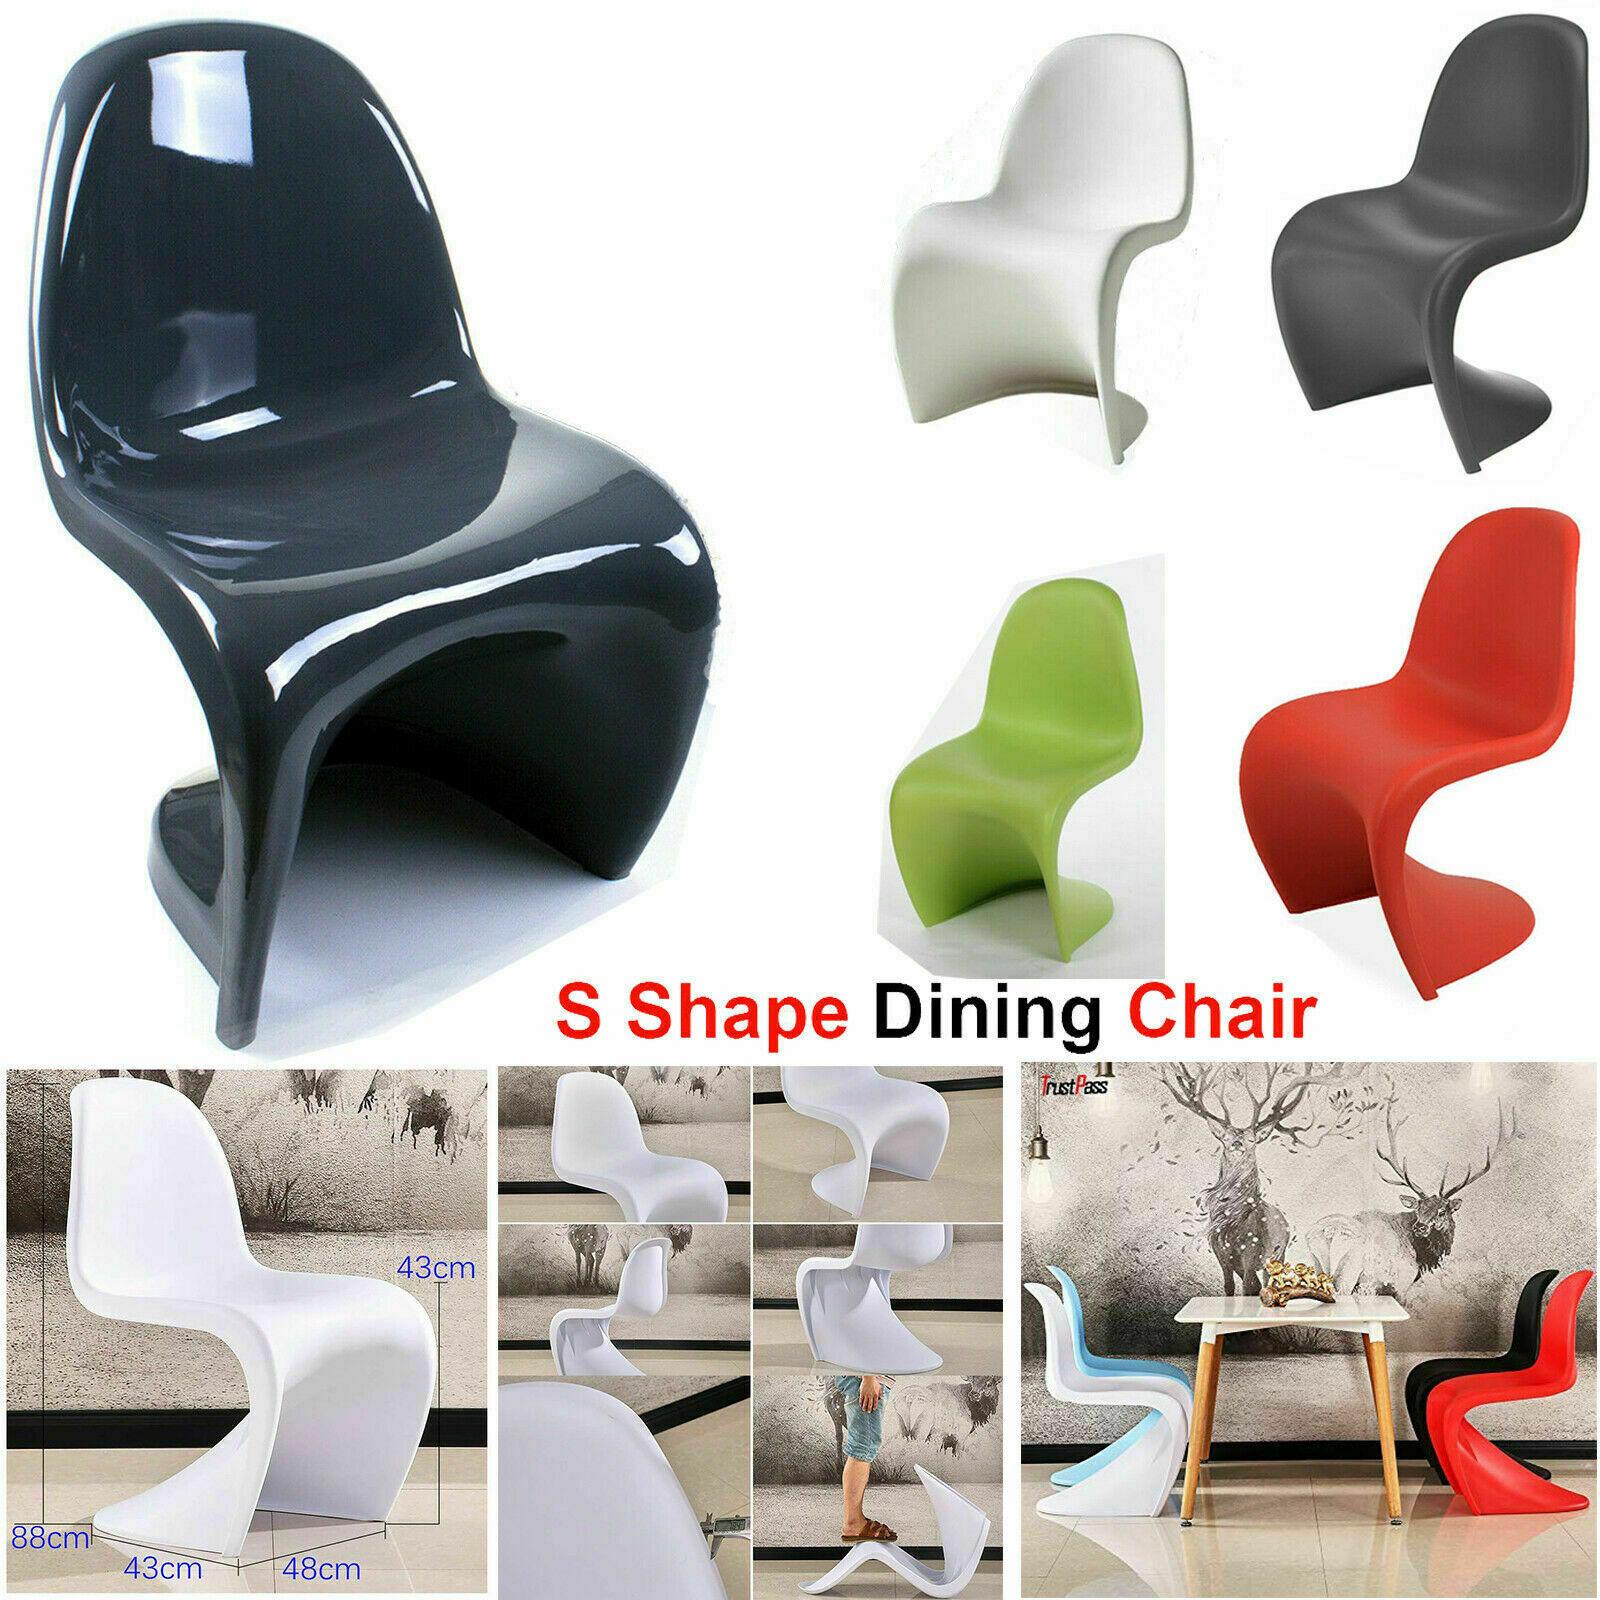 plastic dining chair panton style s modern stylish graphite seat furniture stool